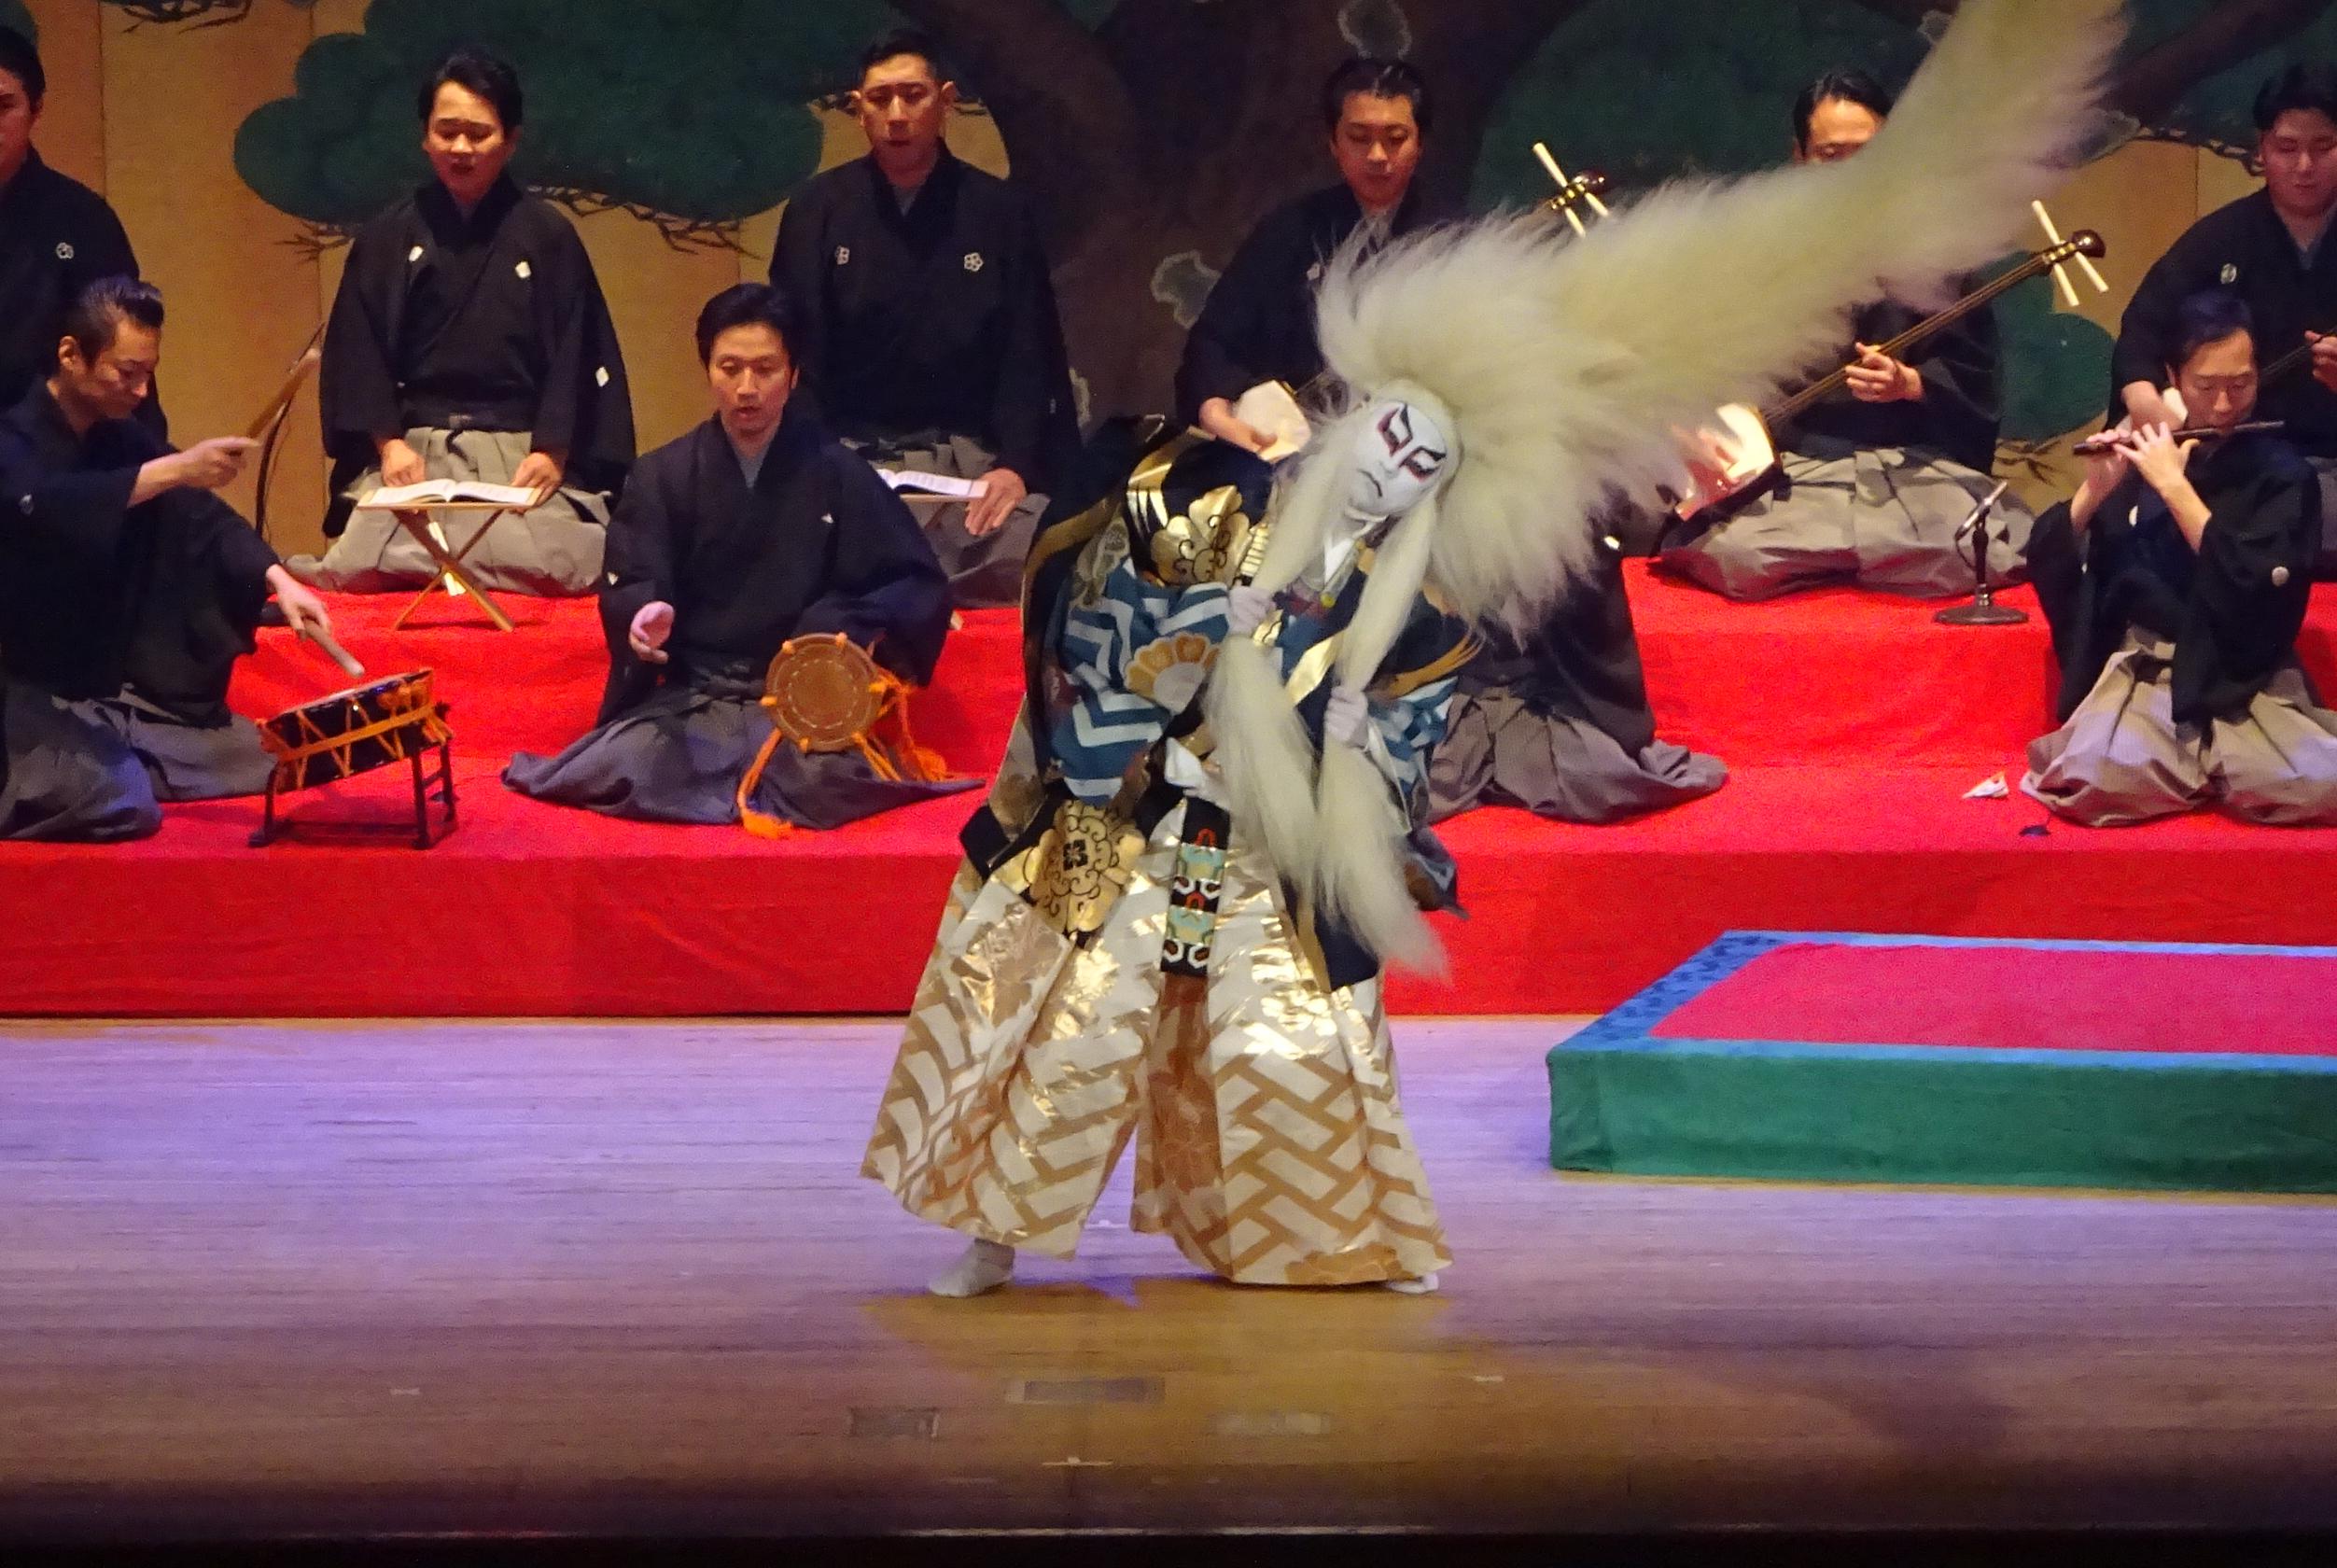 南野陽子&葛西聖司「伝統芸能の魅力発見!」より